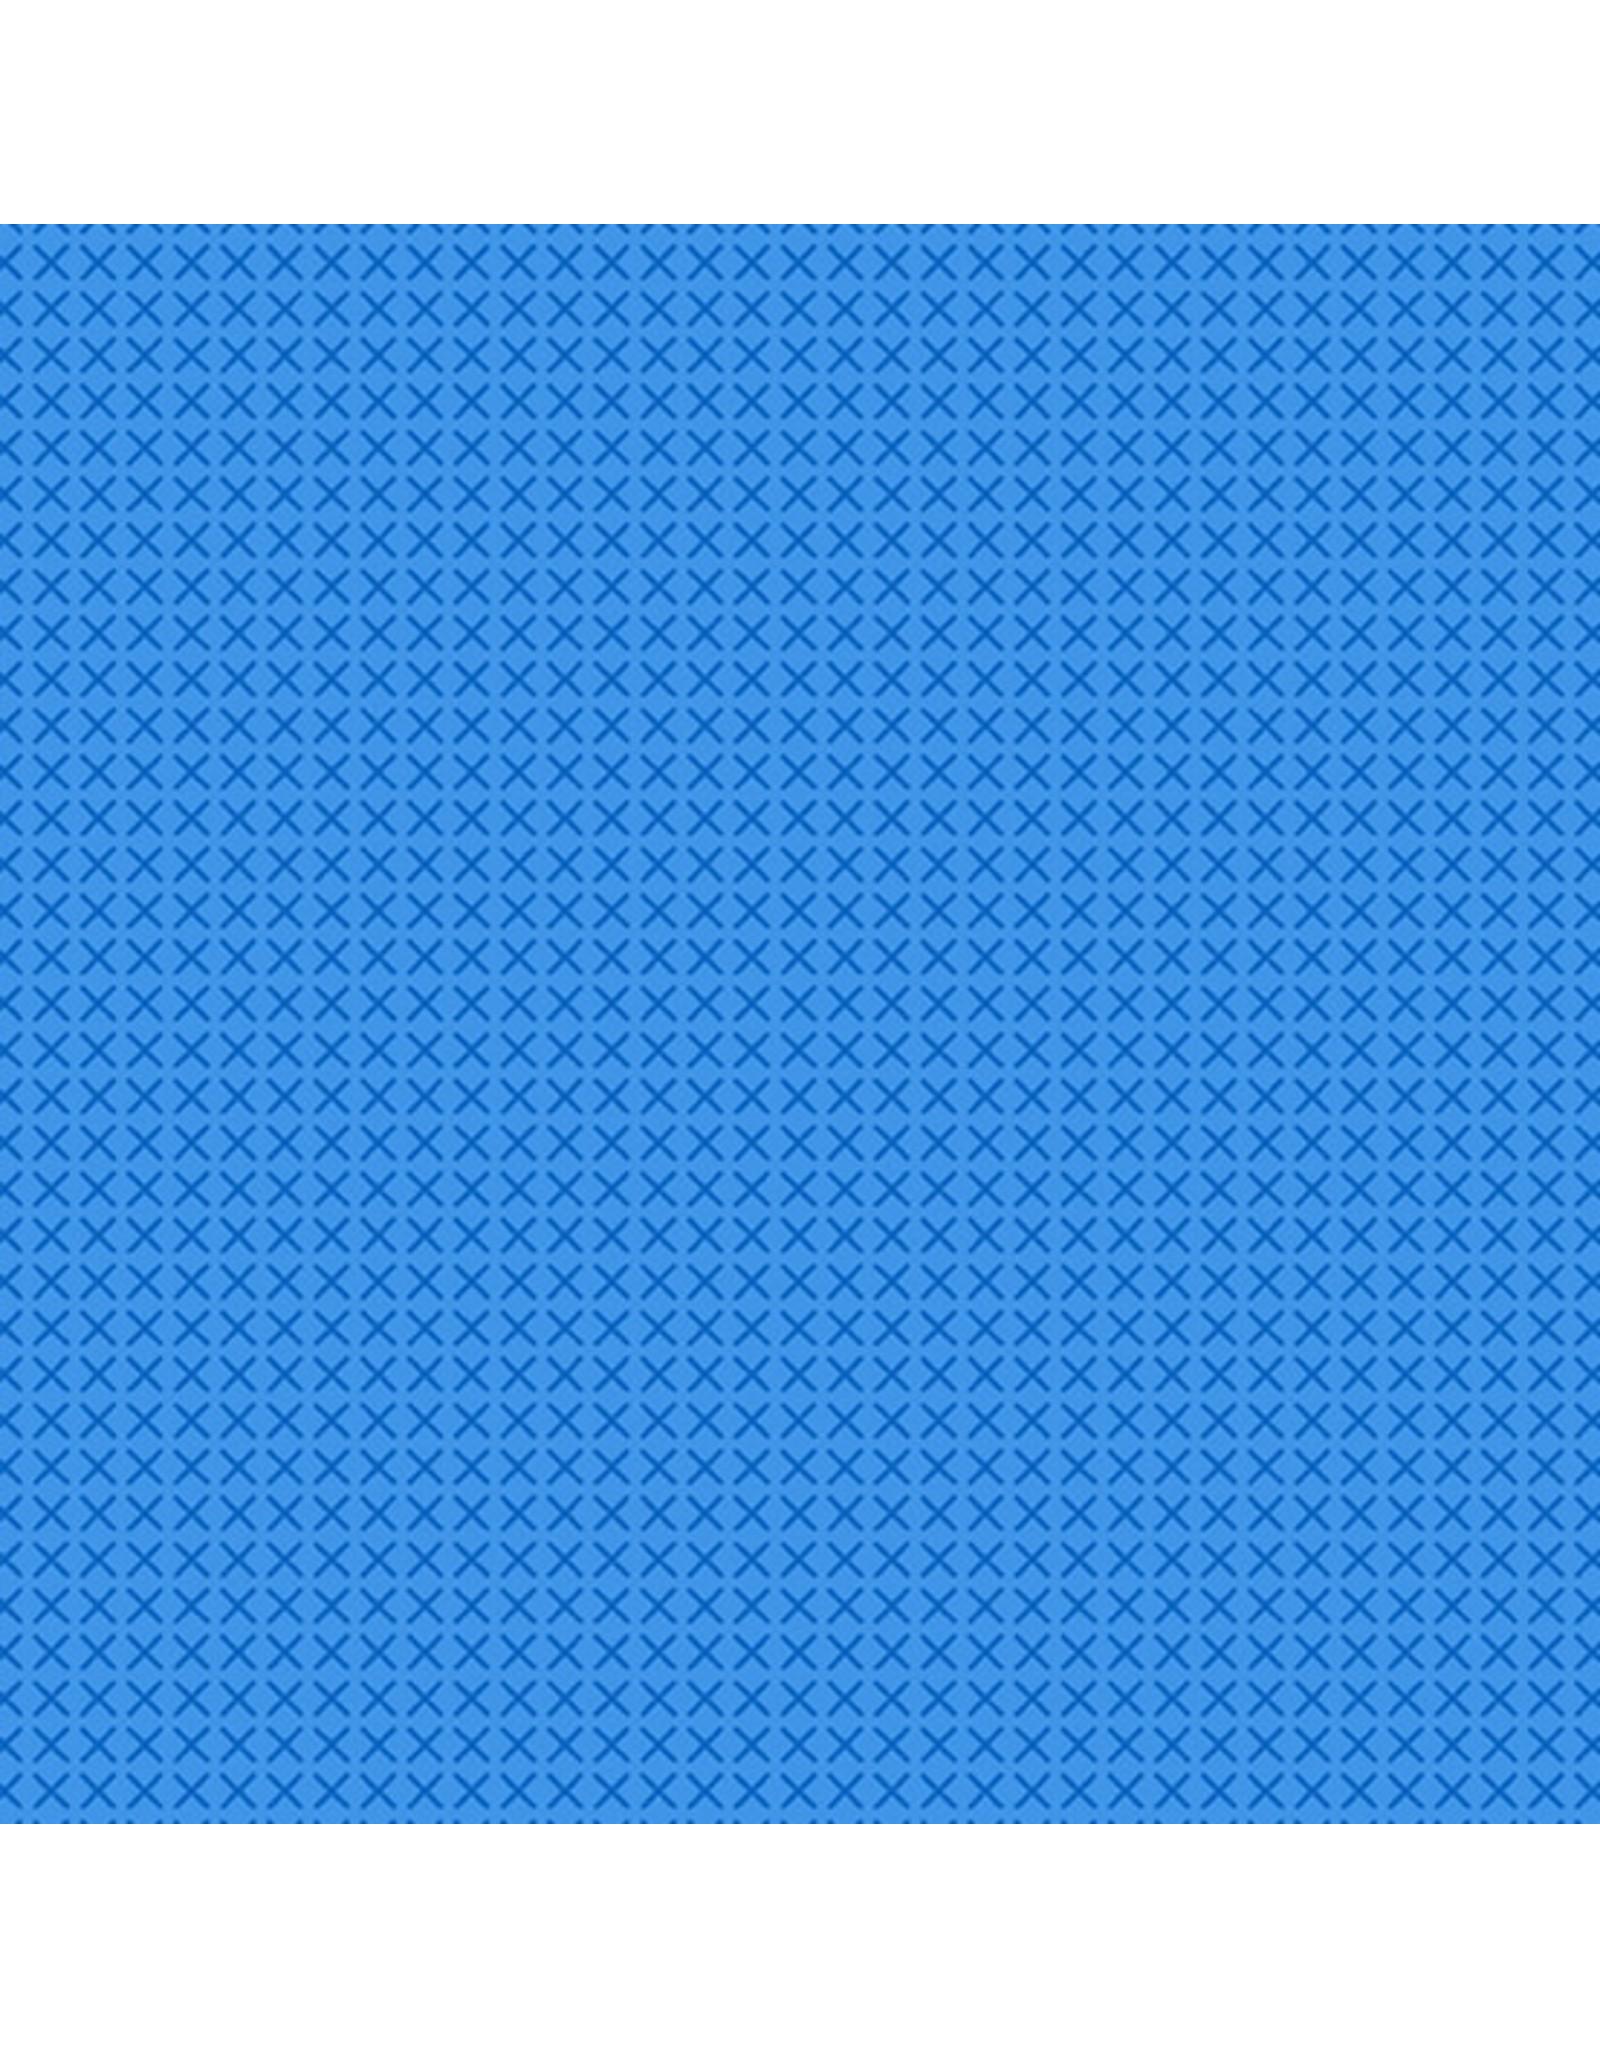 Andover Cross Stitch - Kitchen Blue